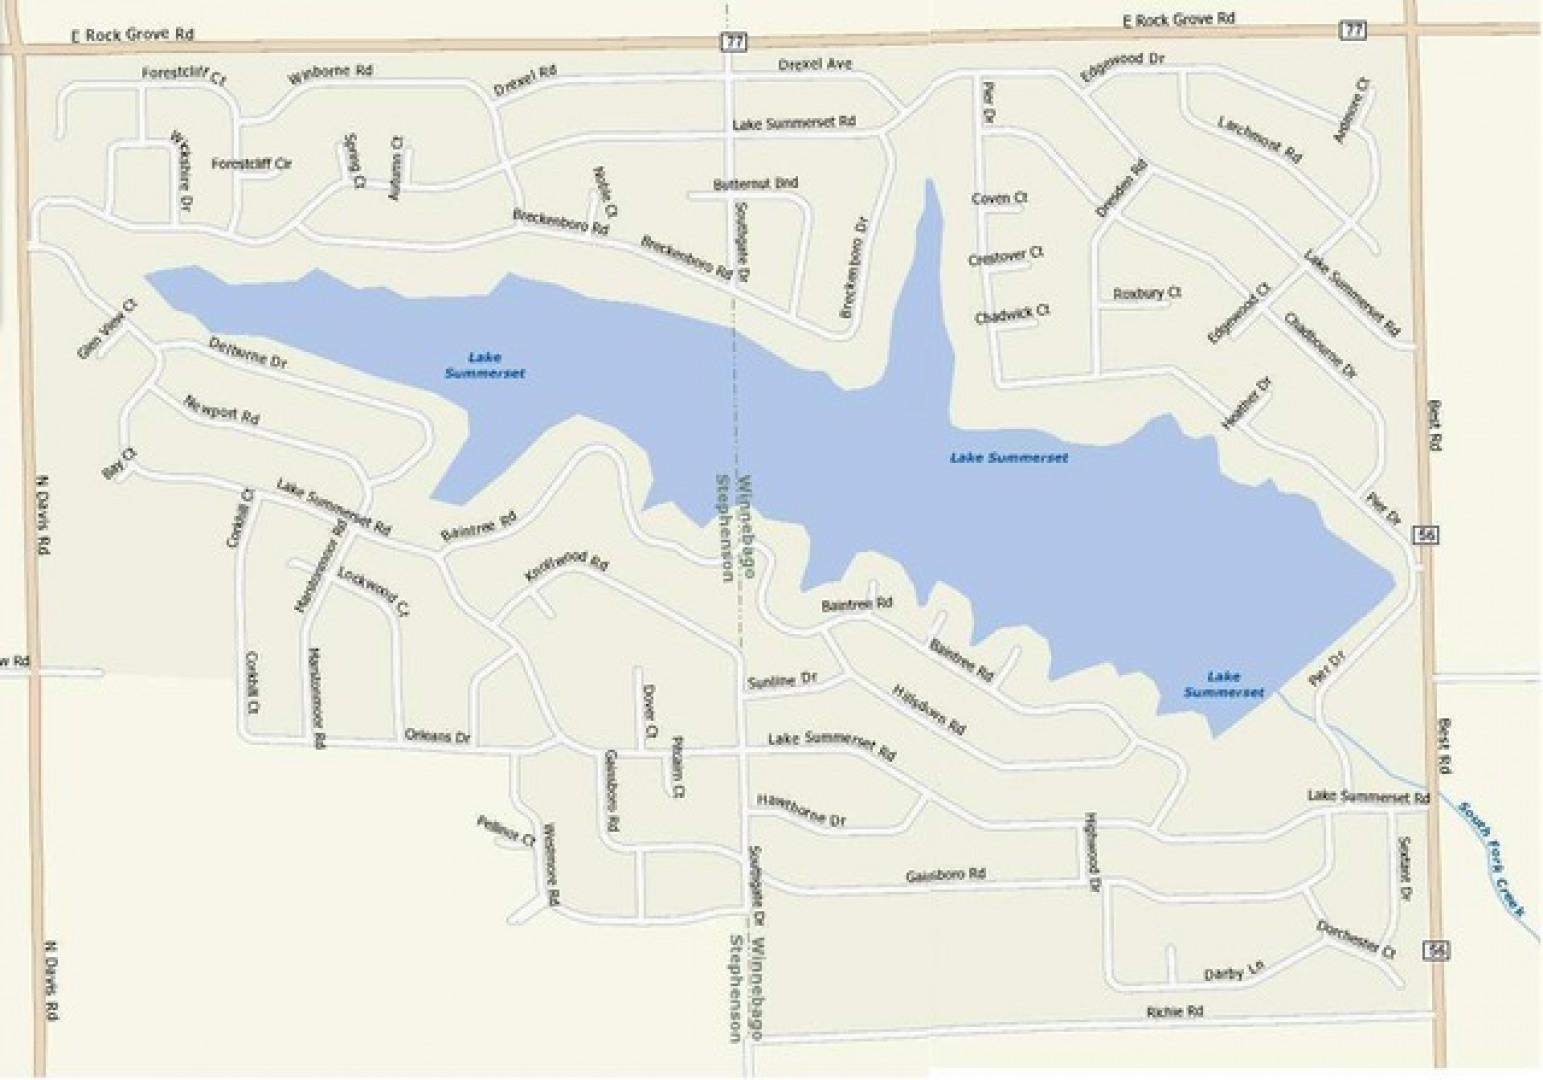 129 Newport Road - Lake Summerset, IL 61019 - MLS# 10034601 ... on north chicago real estate map, eagle ridge resort map, illinois real estate map, lake carroll real estate map,